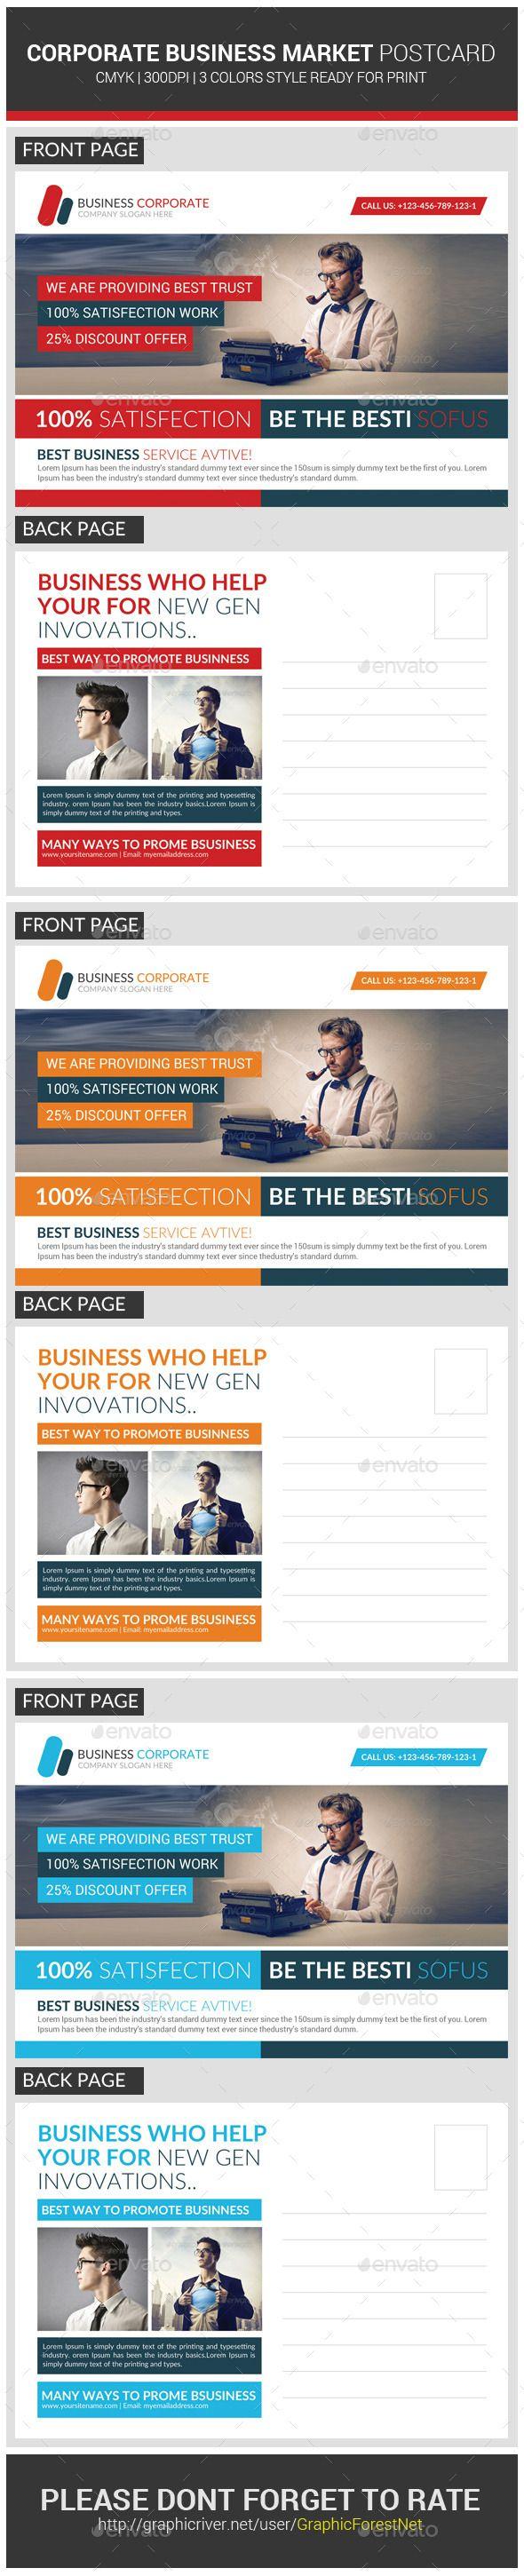 Marketing Corporate Business Postcard Template